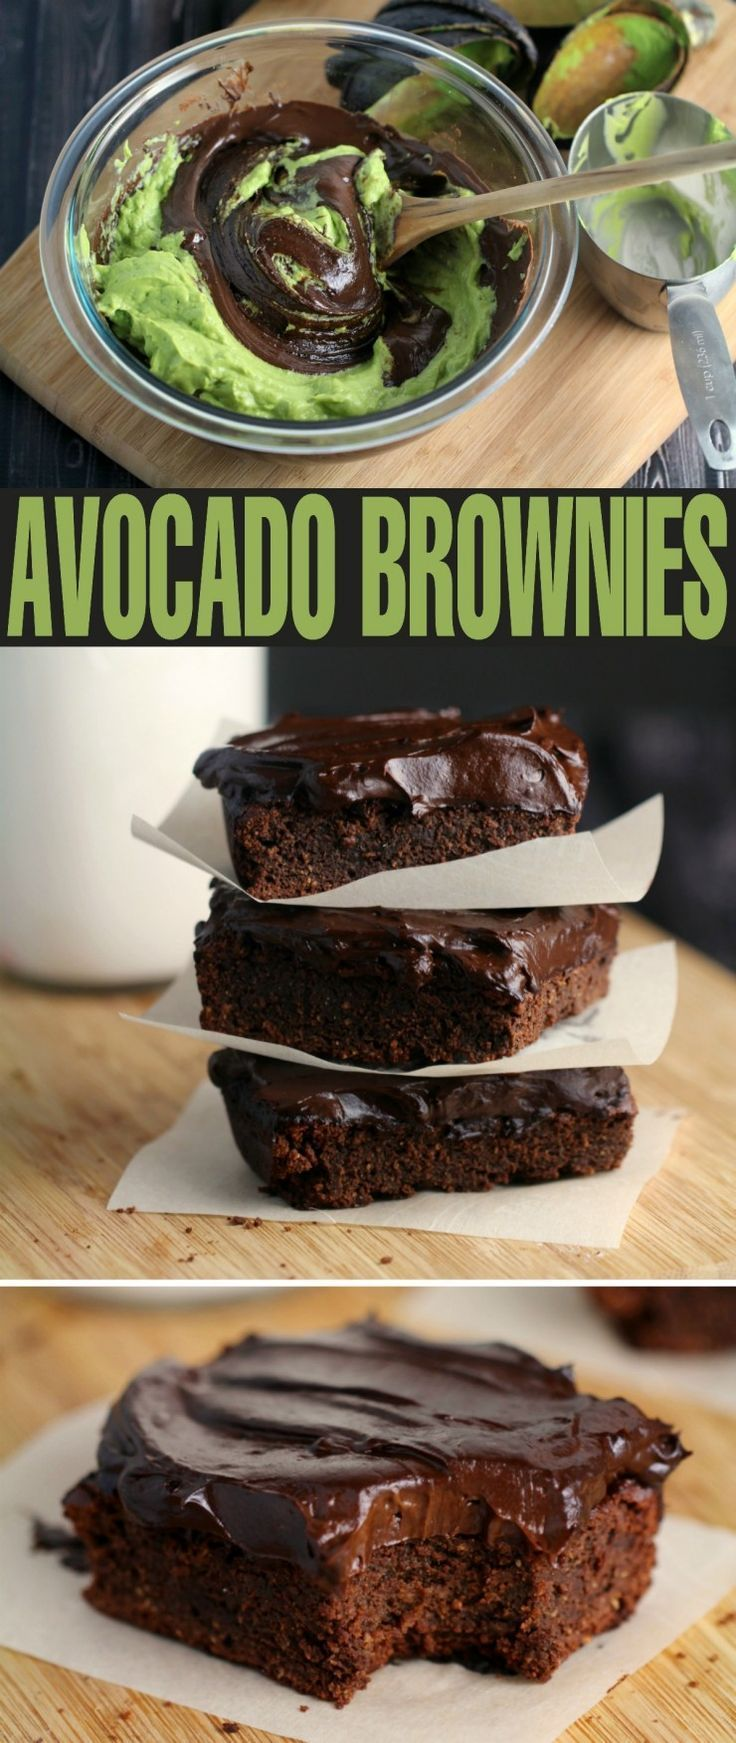 Fudgy Avocado Brownies mit dem Avocado-Bereifen